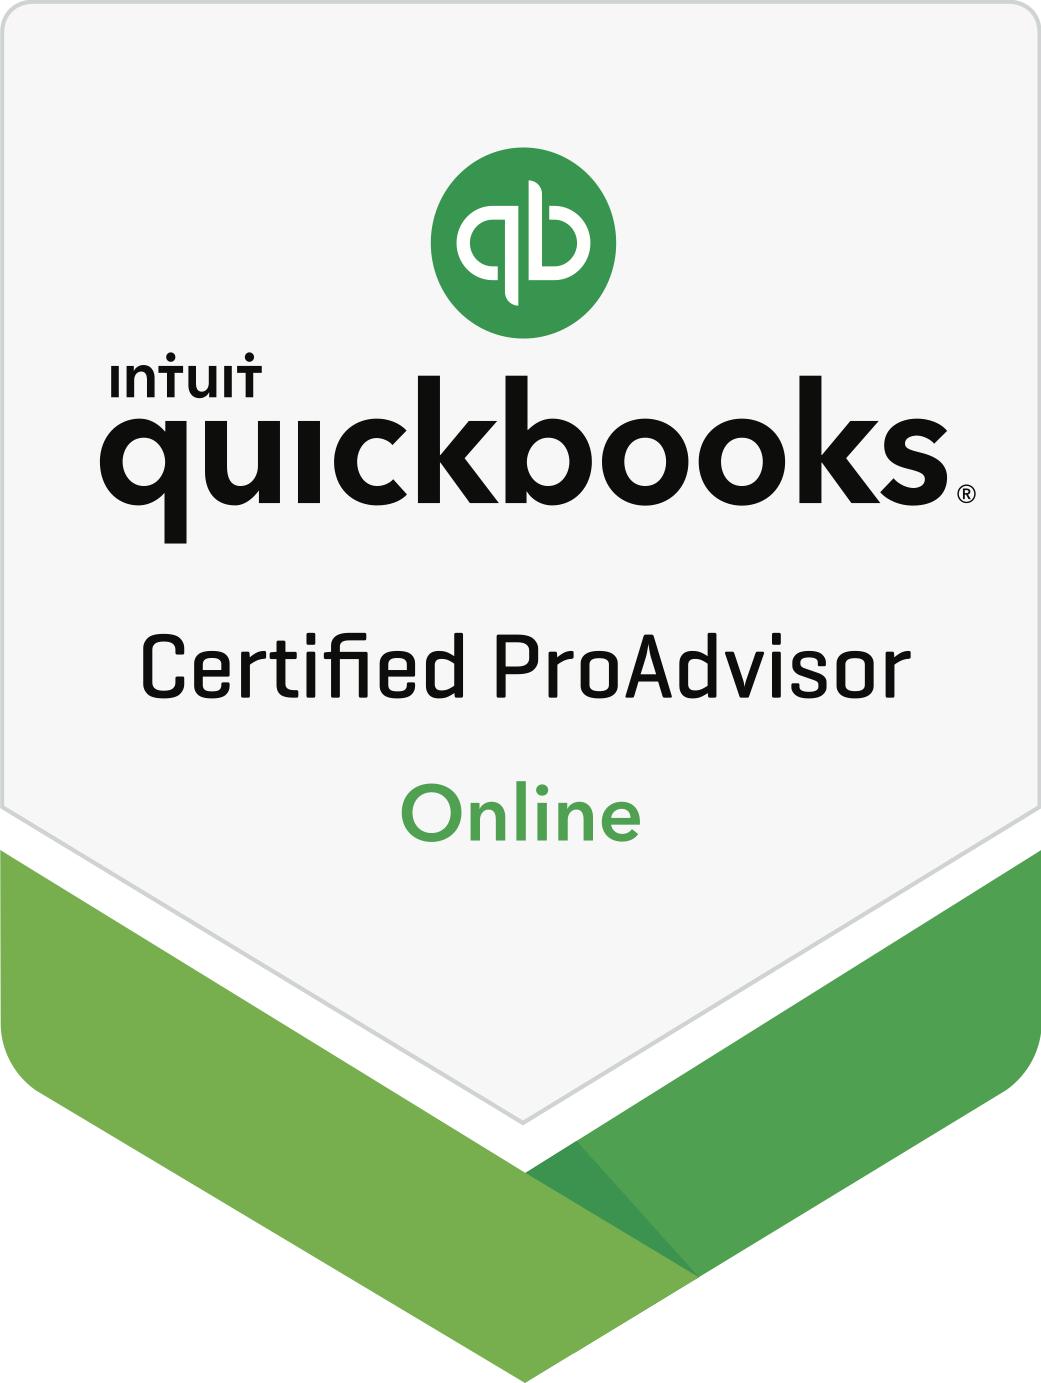 Quickbooks certified proadvisor affiliation